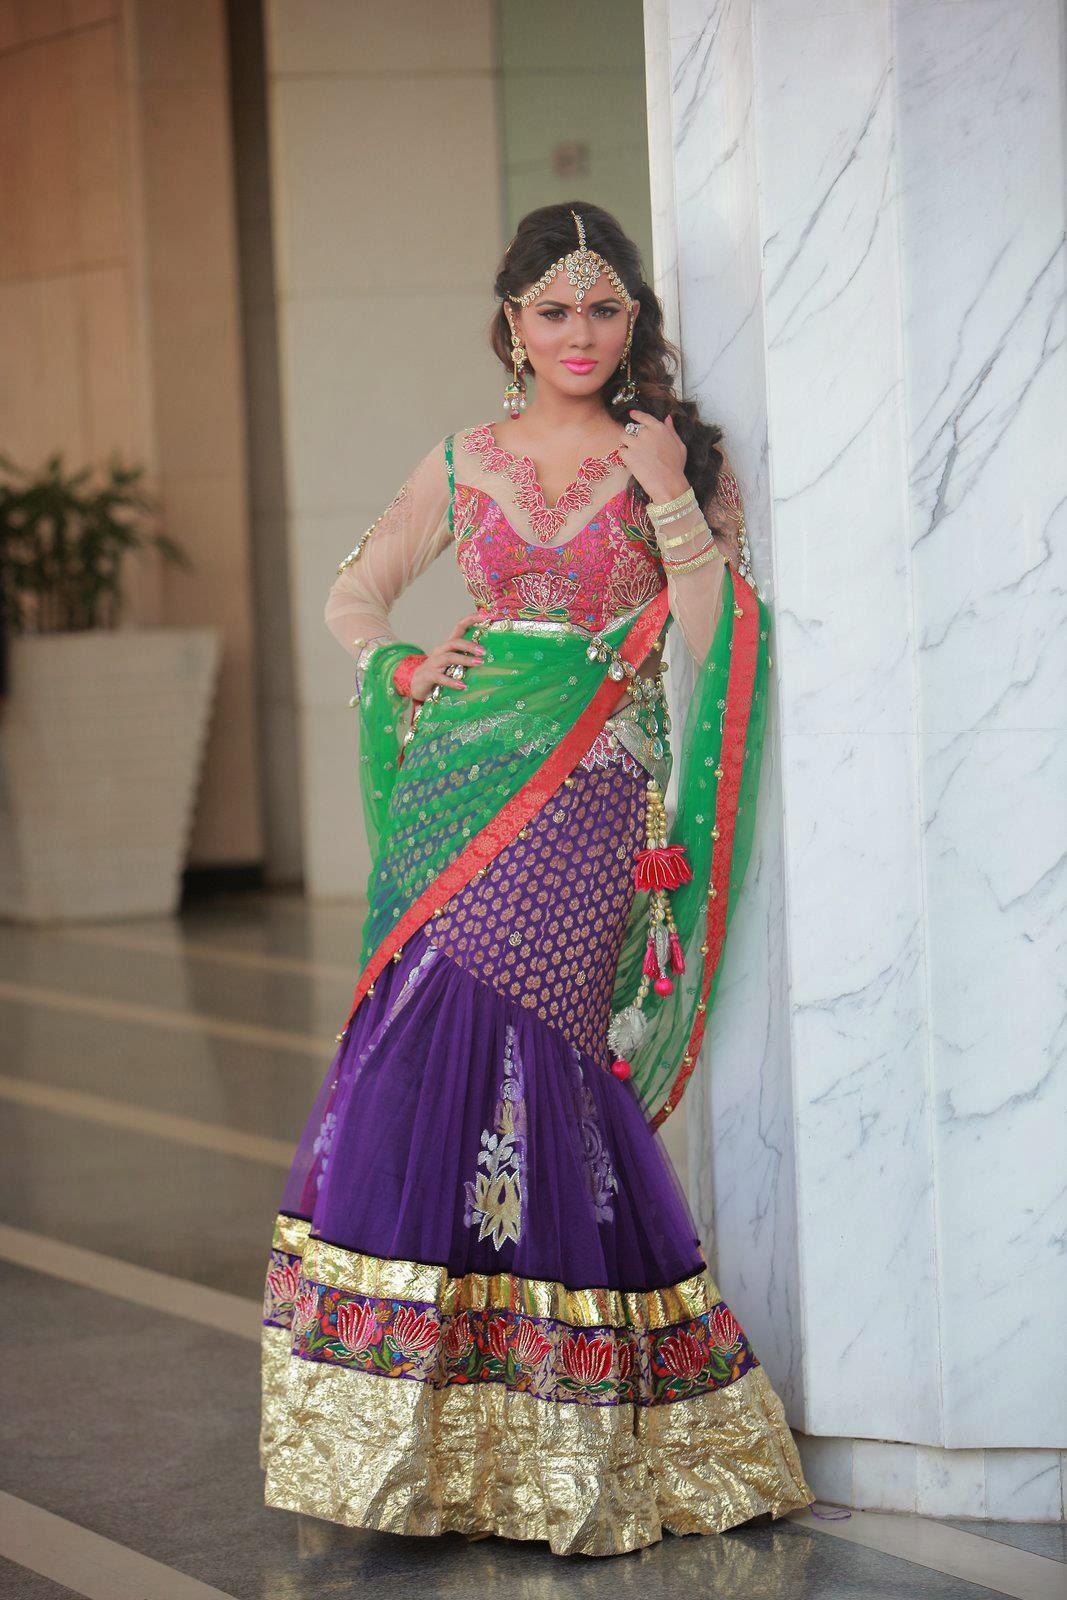 traditonal dresses